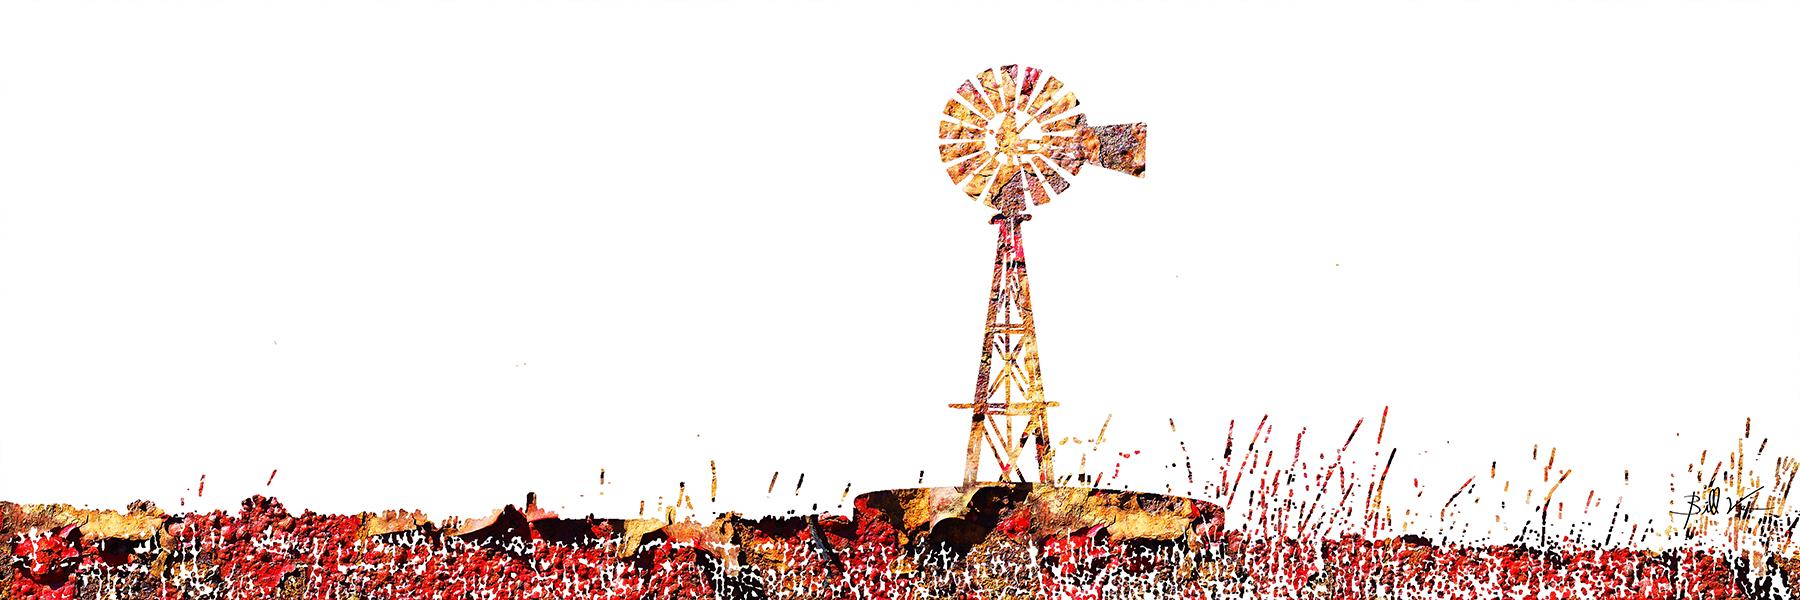 Windmill in the Field